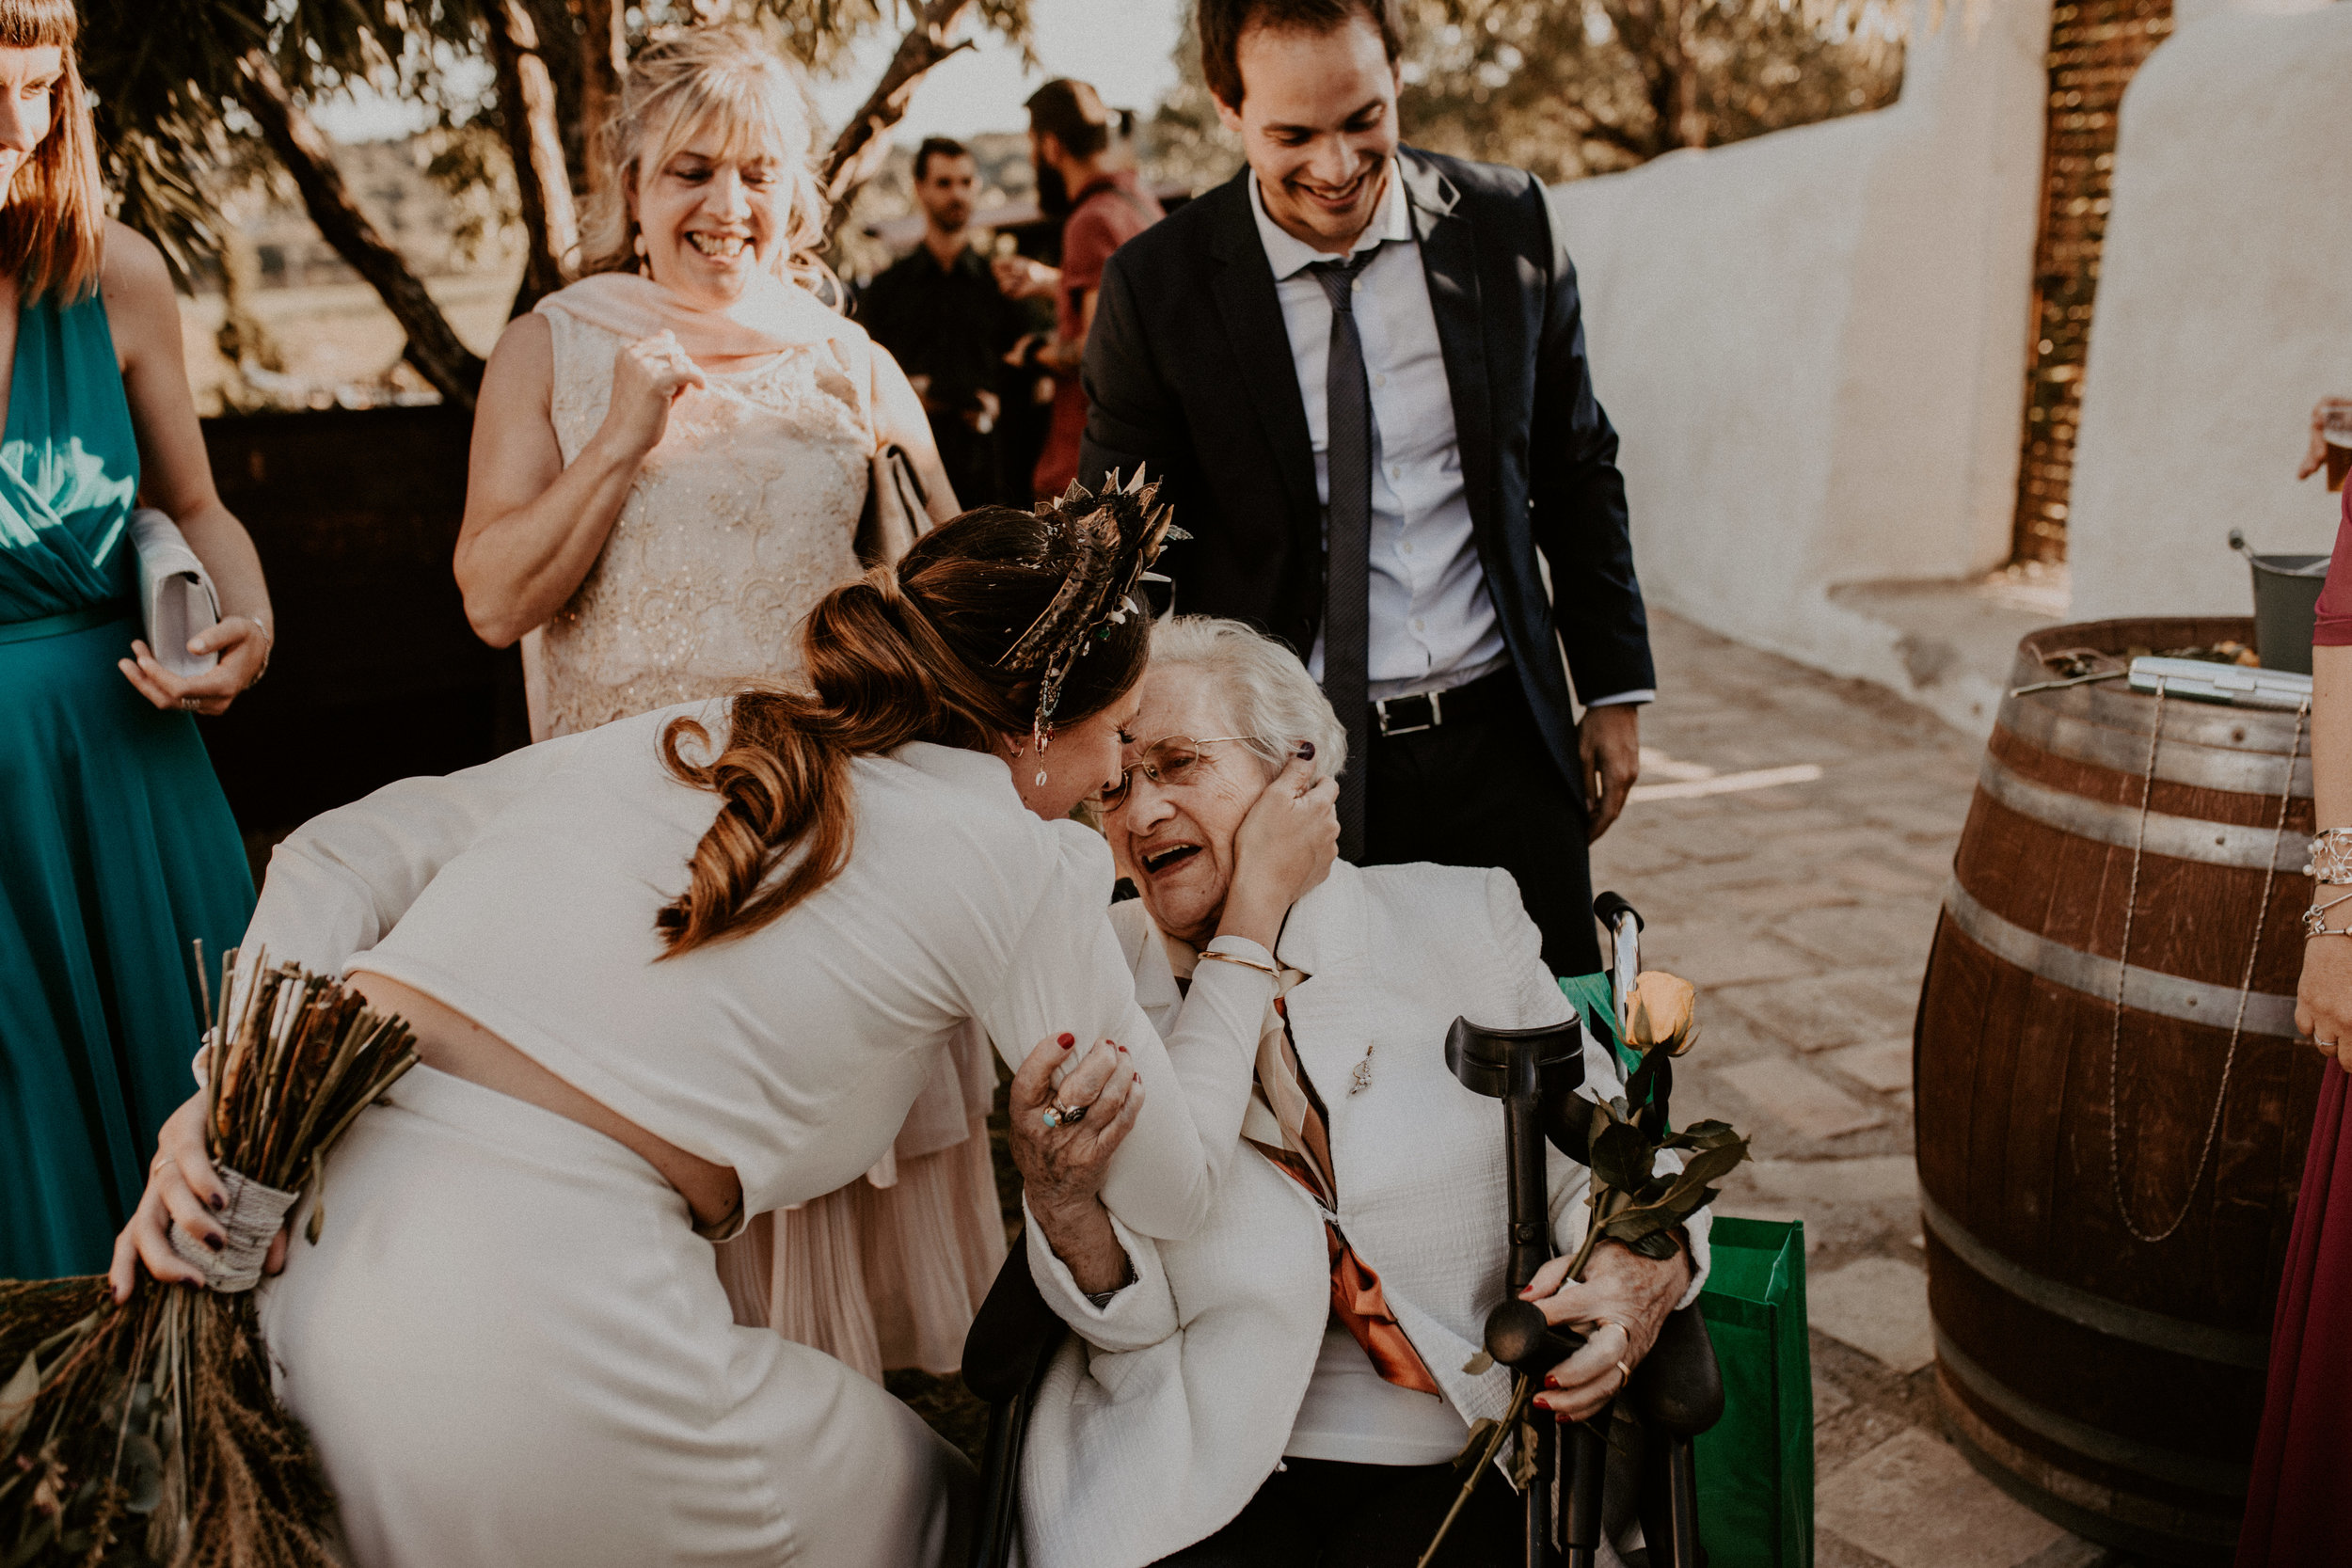 thenortherngirlphotography-fotografa-de-bodas-barcelona_destinartion-wedding-photographer_wedding-photographer_moroccan-wedding_HADNANANTIGONA-817.jpg